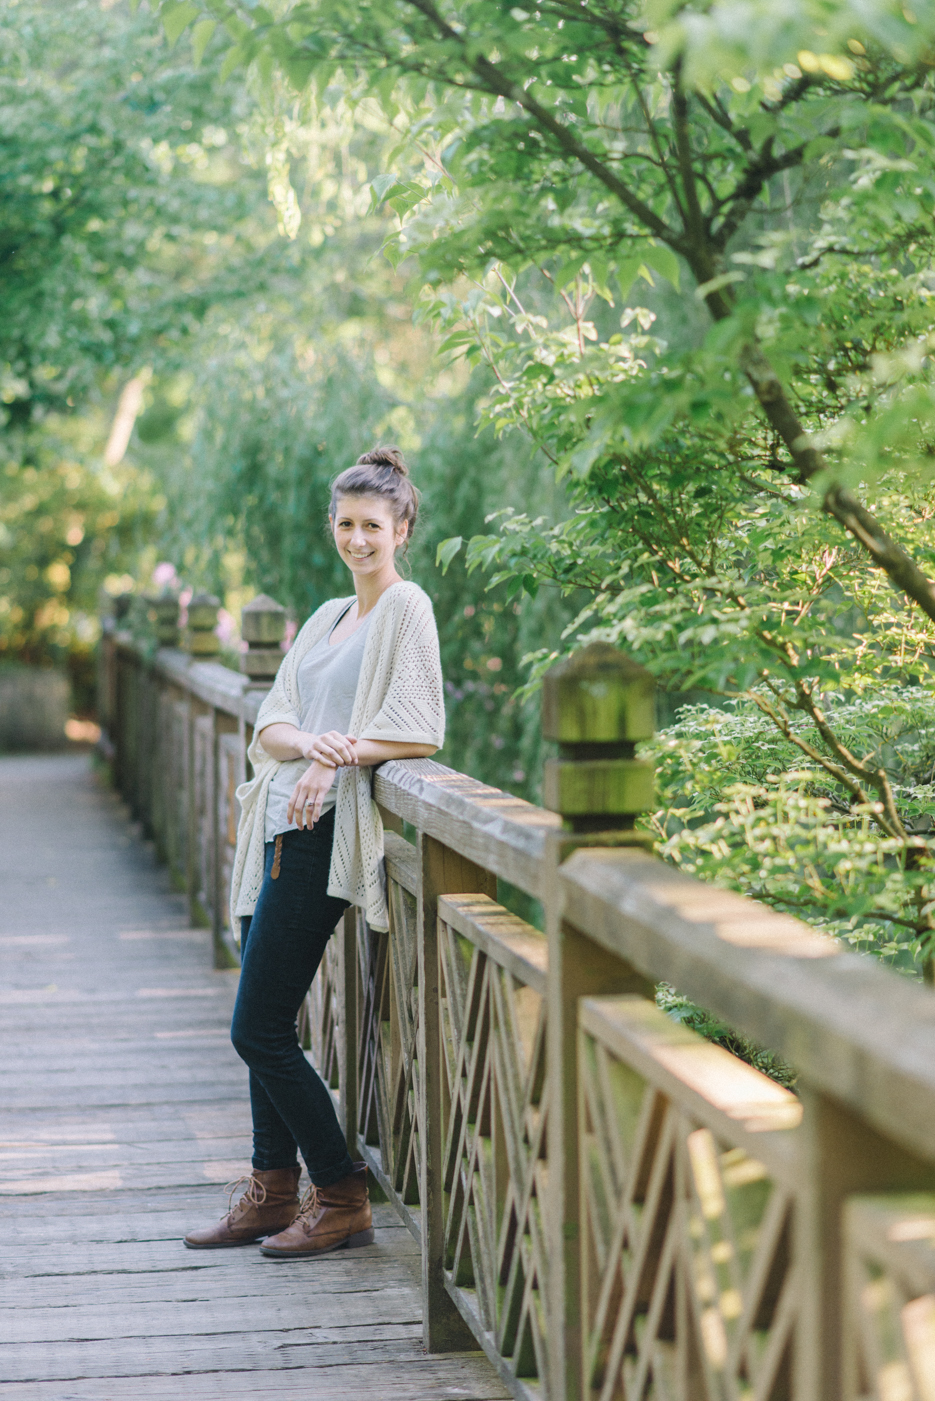 best-senior-portraits-2014-portland-oregon-bridge-crystal-springs-rhododendron-garden-6.jpg